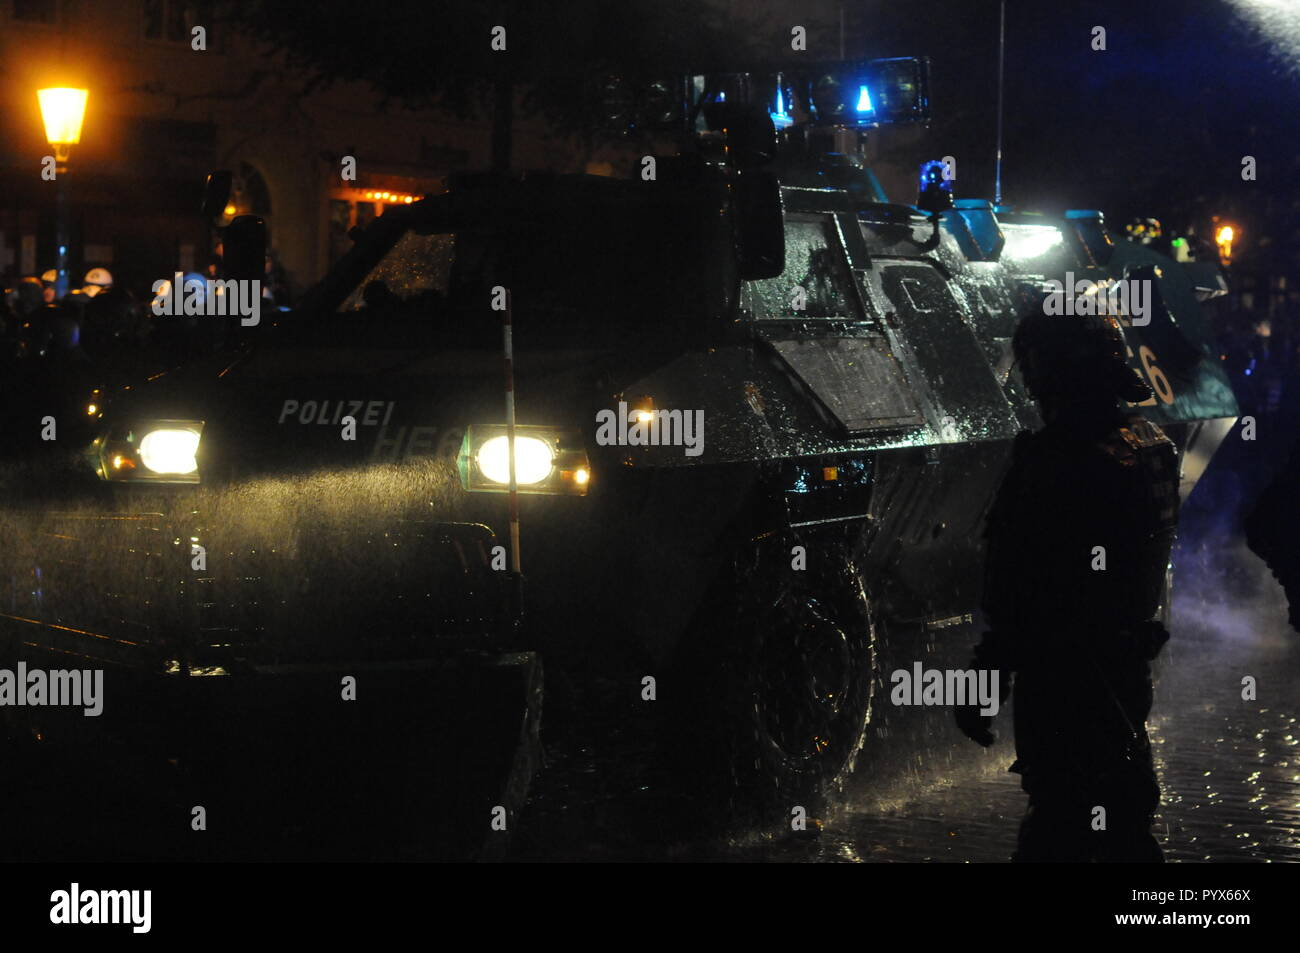 Anti-G20 protest: violent night riots occur near Rote Flora squatt, Hamburg, Germany - Stock Image